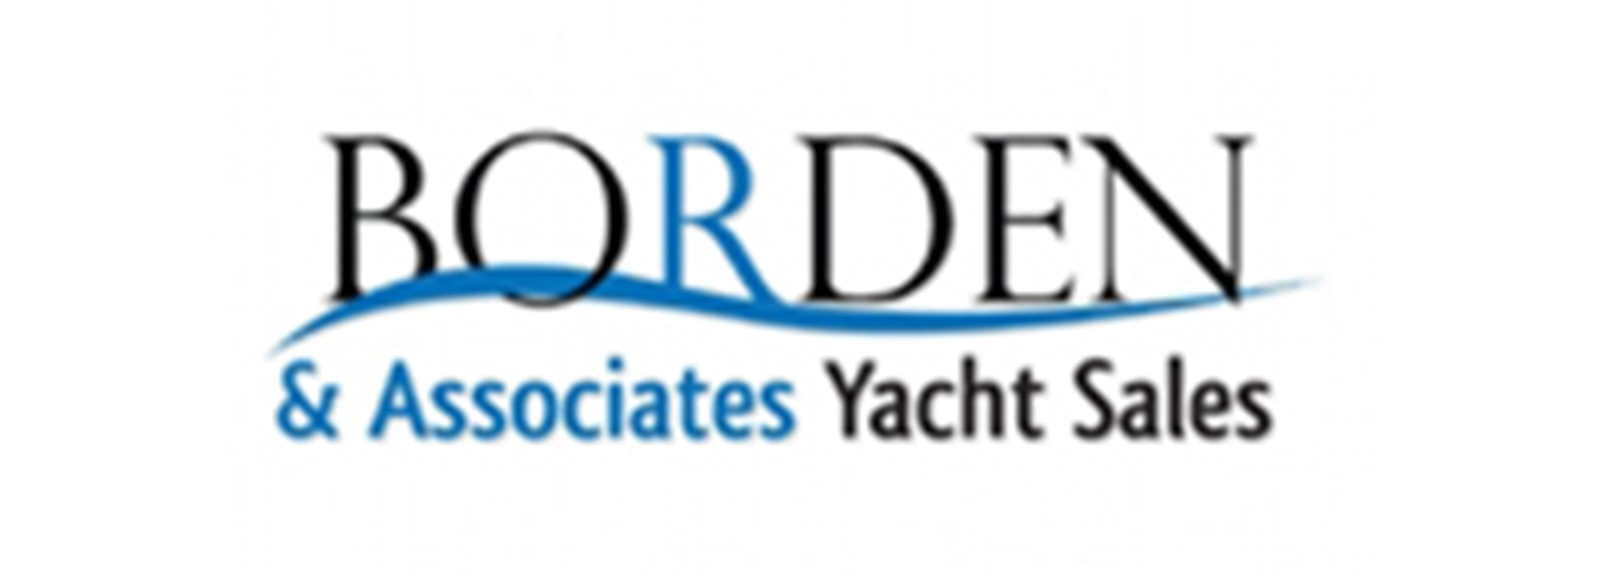 Borden and Associates Yacht Sales